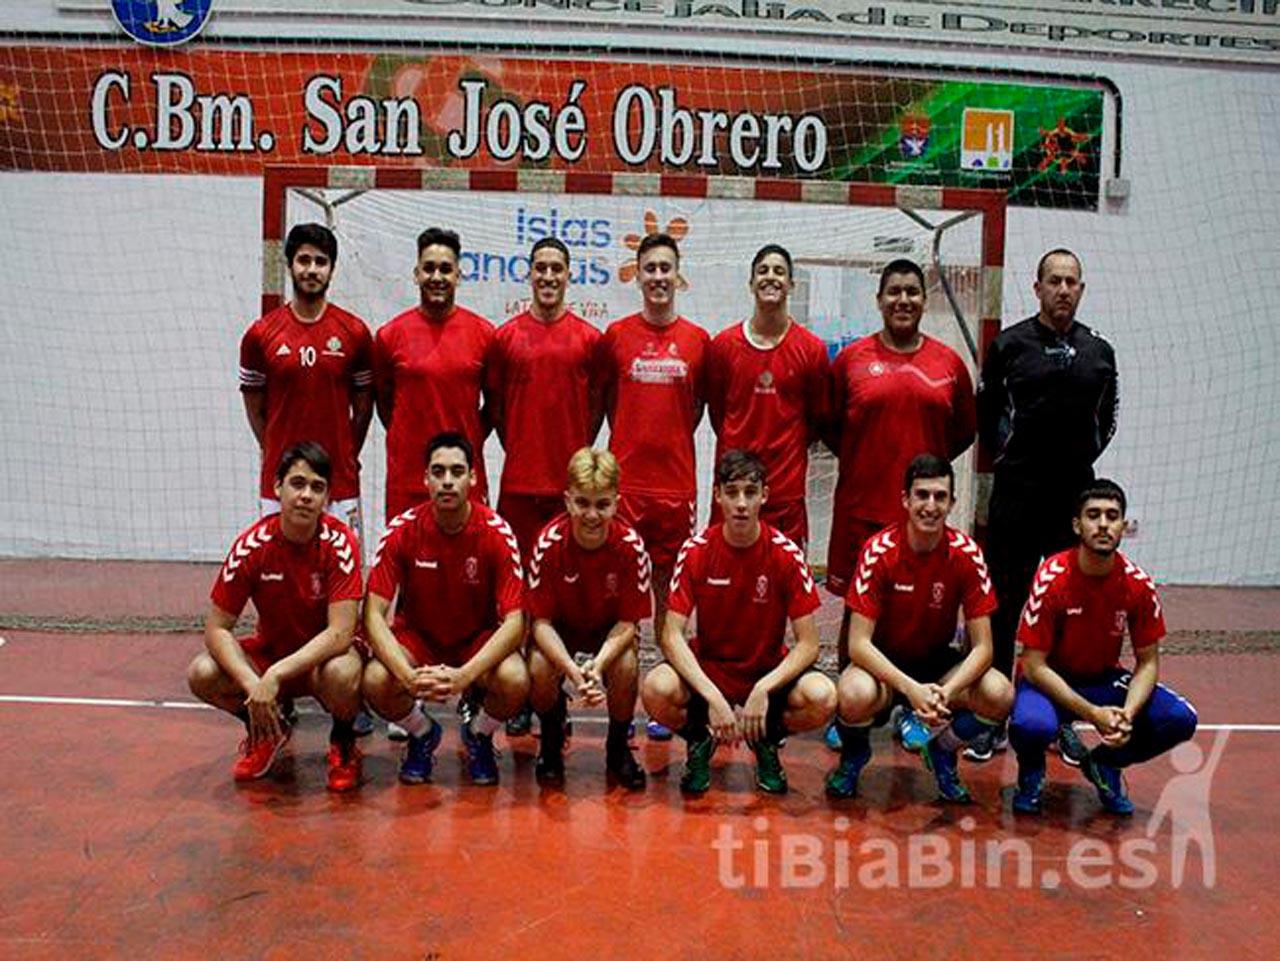 Nota de Prensa CB San José Obrero. Cto Canarias Juvenil. CB Realejos